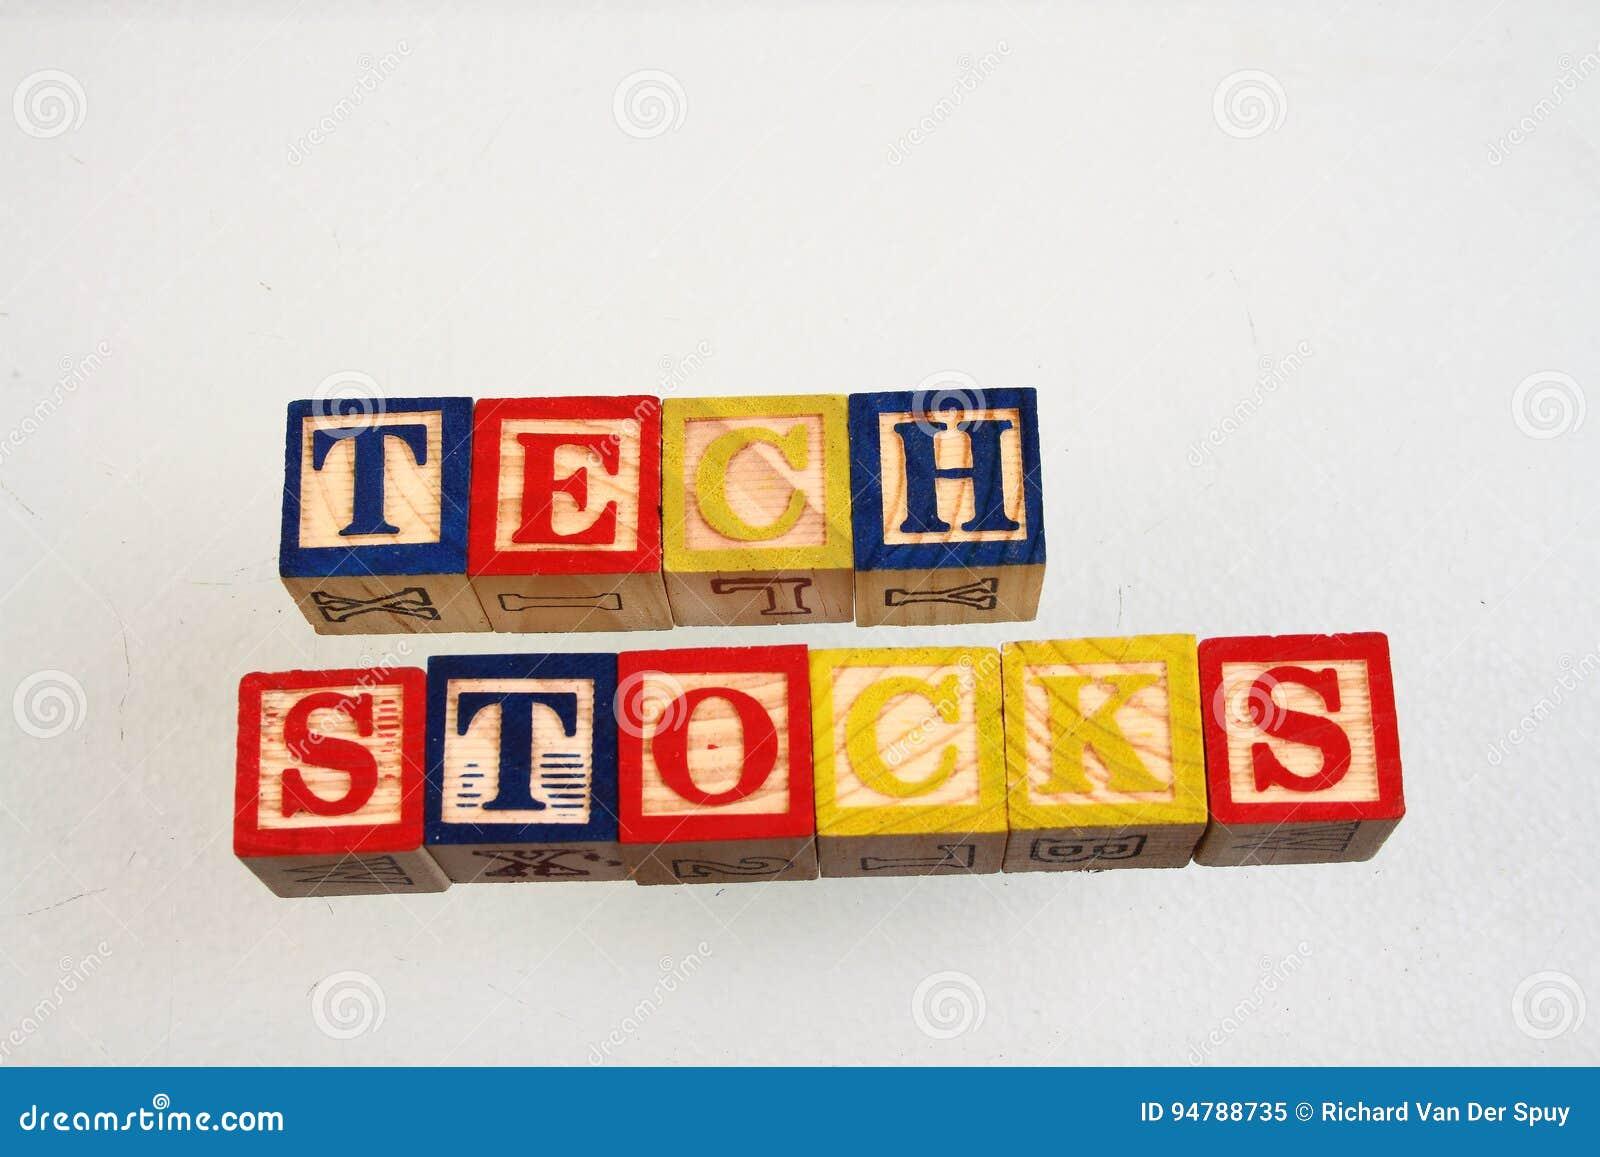 The term tech stocks